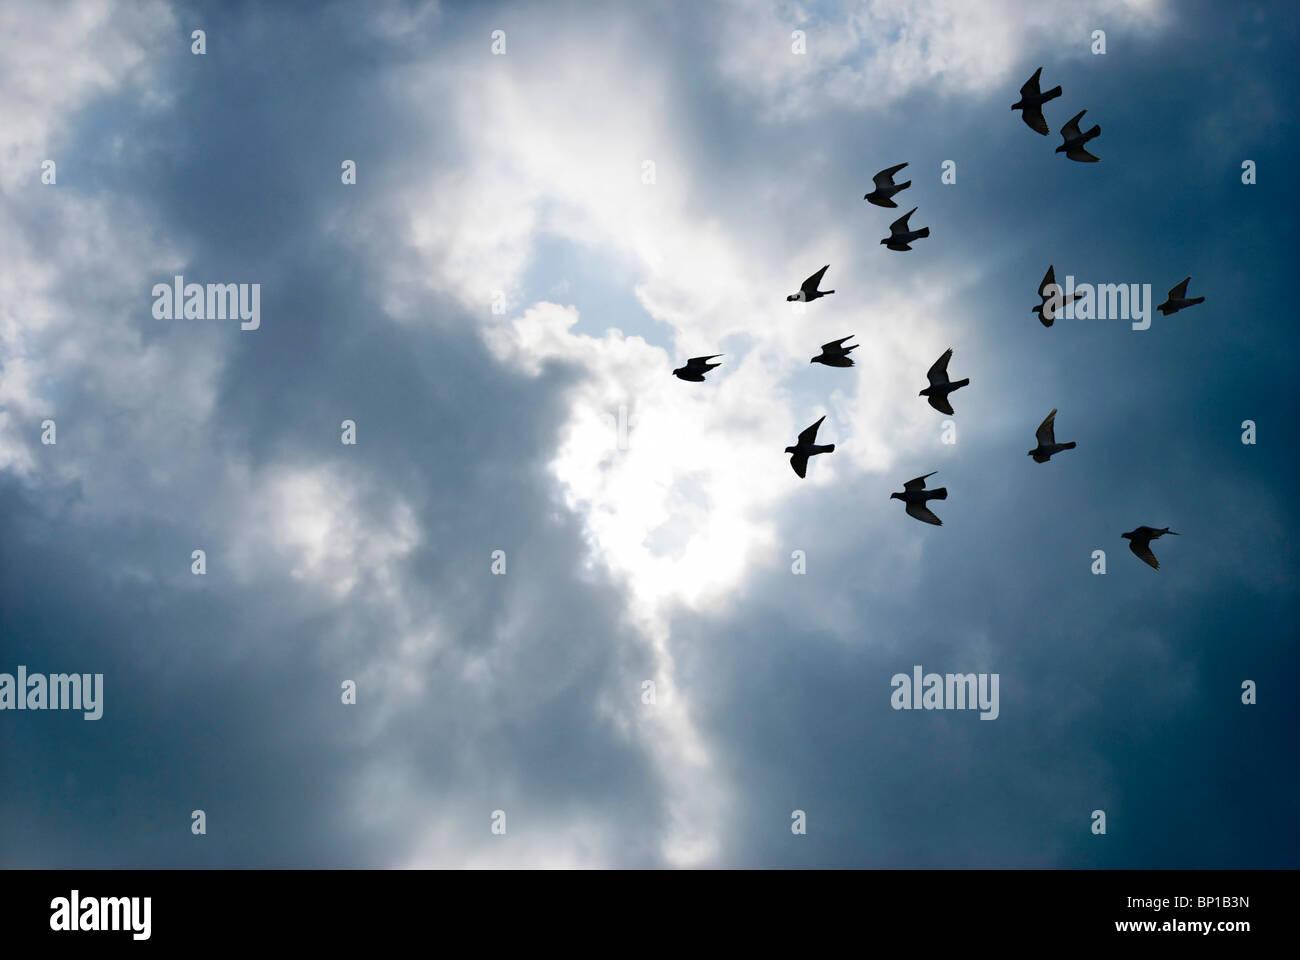 Pájaros volando innovador concepto de nubes grises volar superar. Imagen De Stock